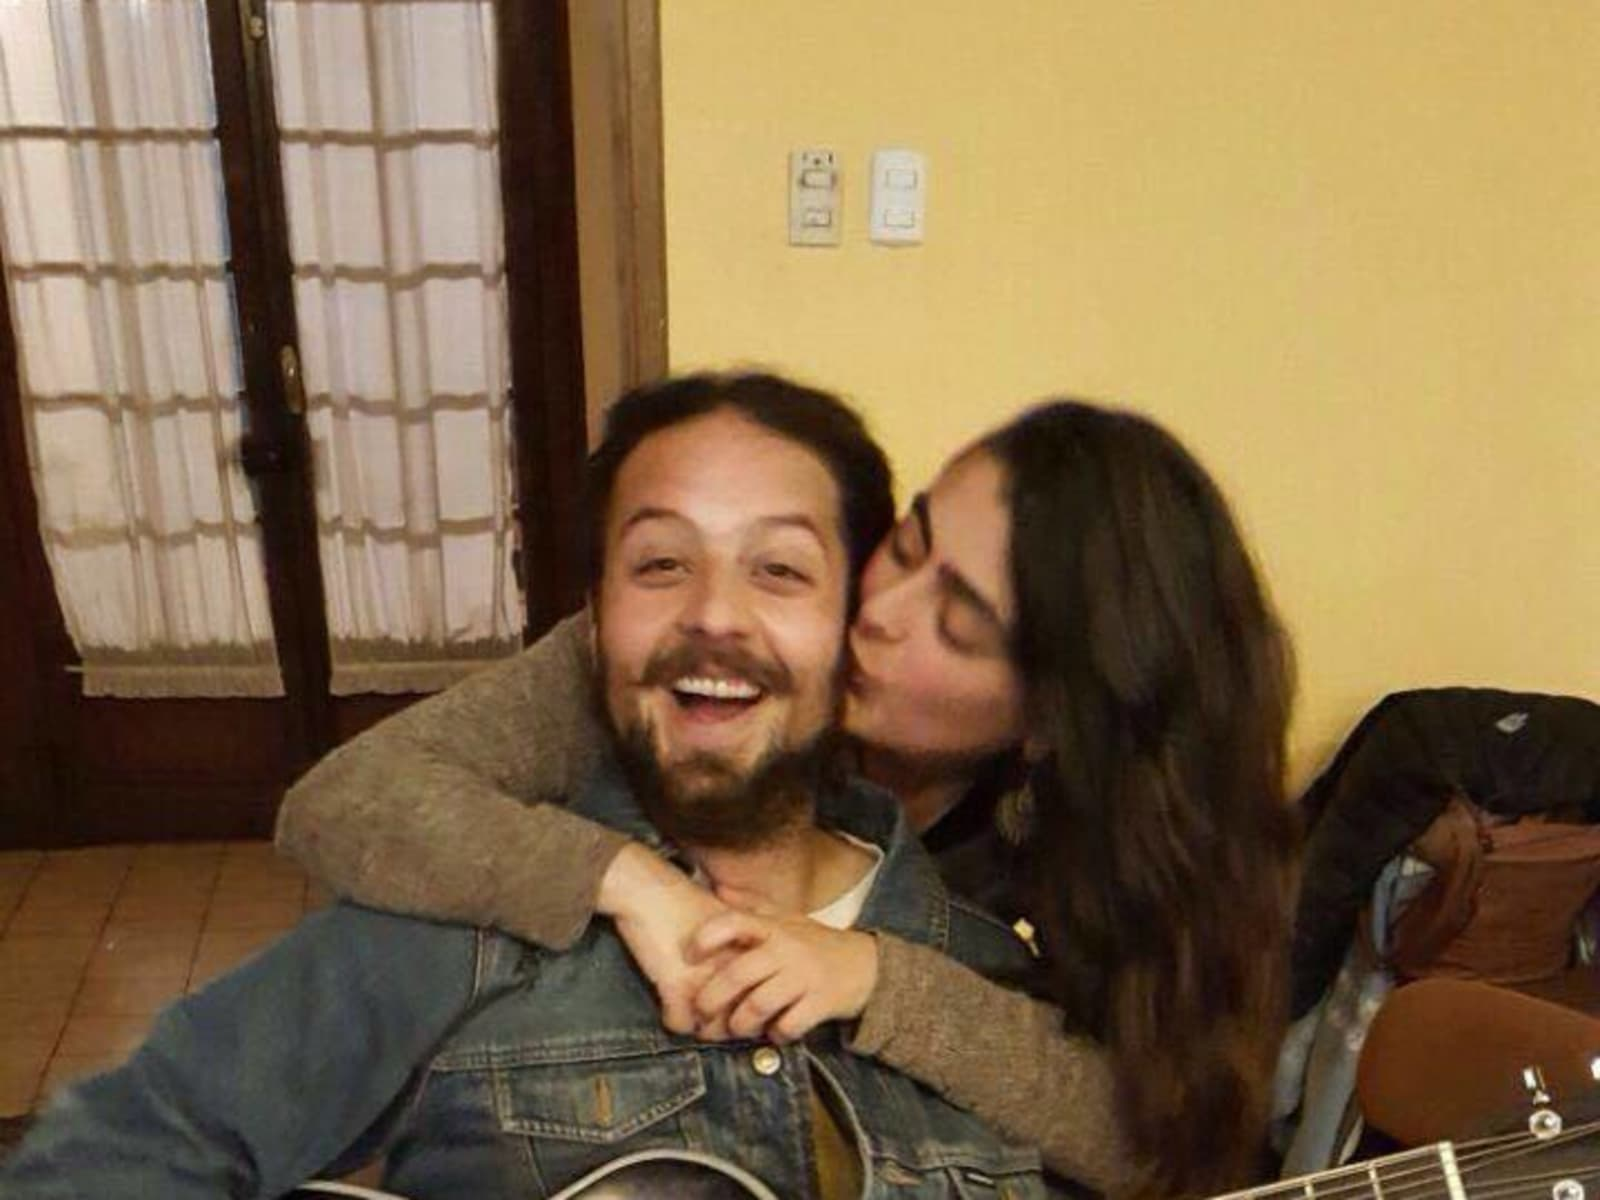 Piera & Ignacio from Madrid, Spain